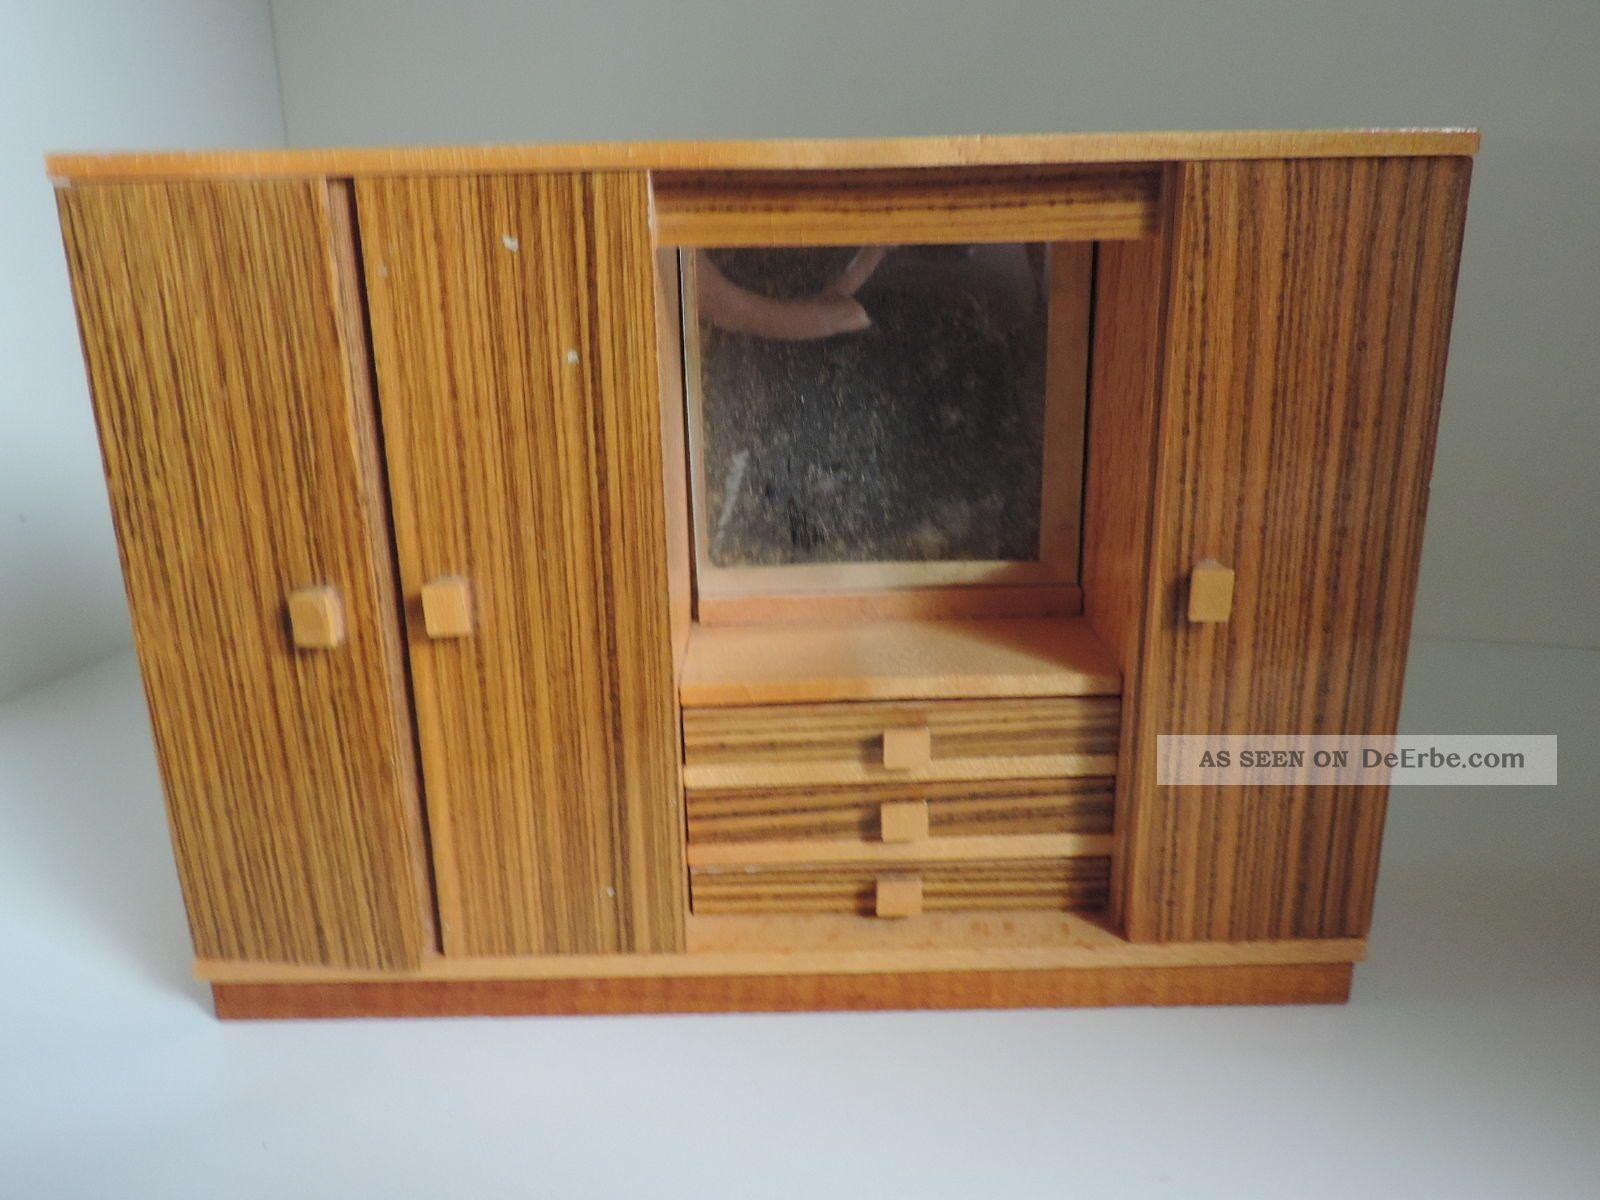 Puppenstubenmöbel, Schlafzimmer 50er - 60er Jahre, Holz